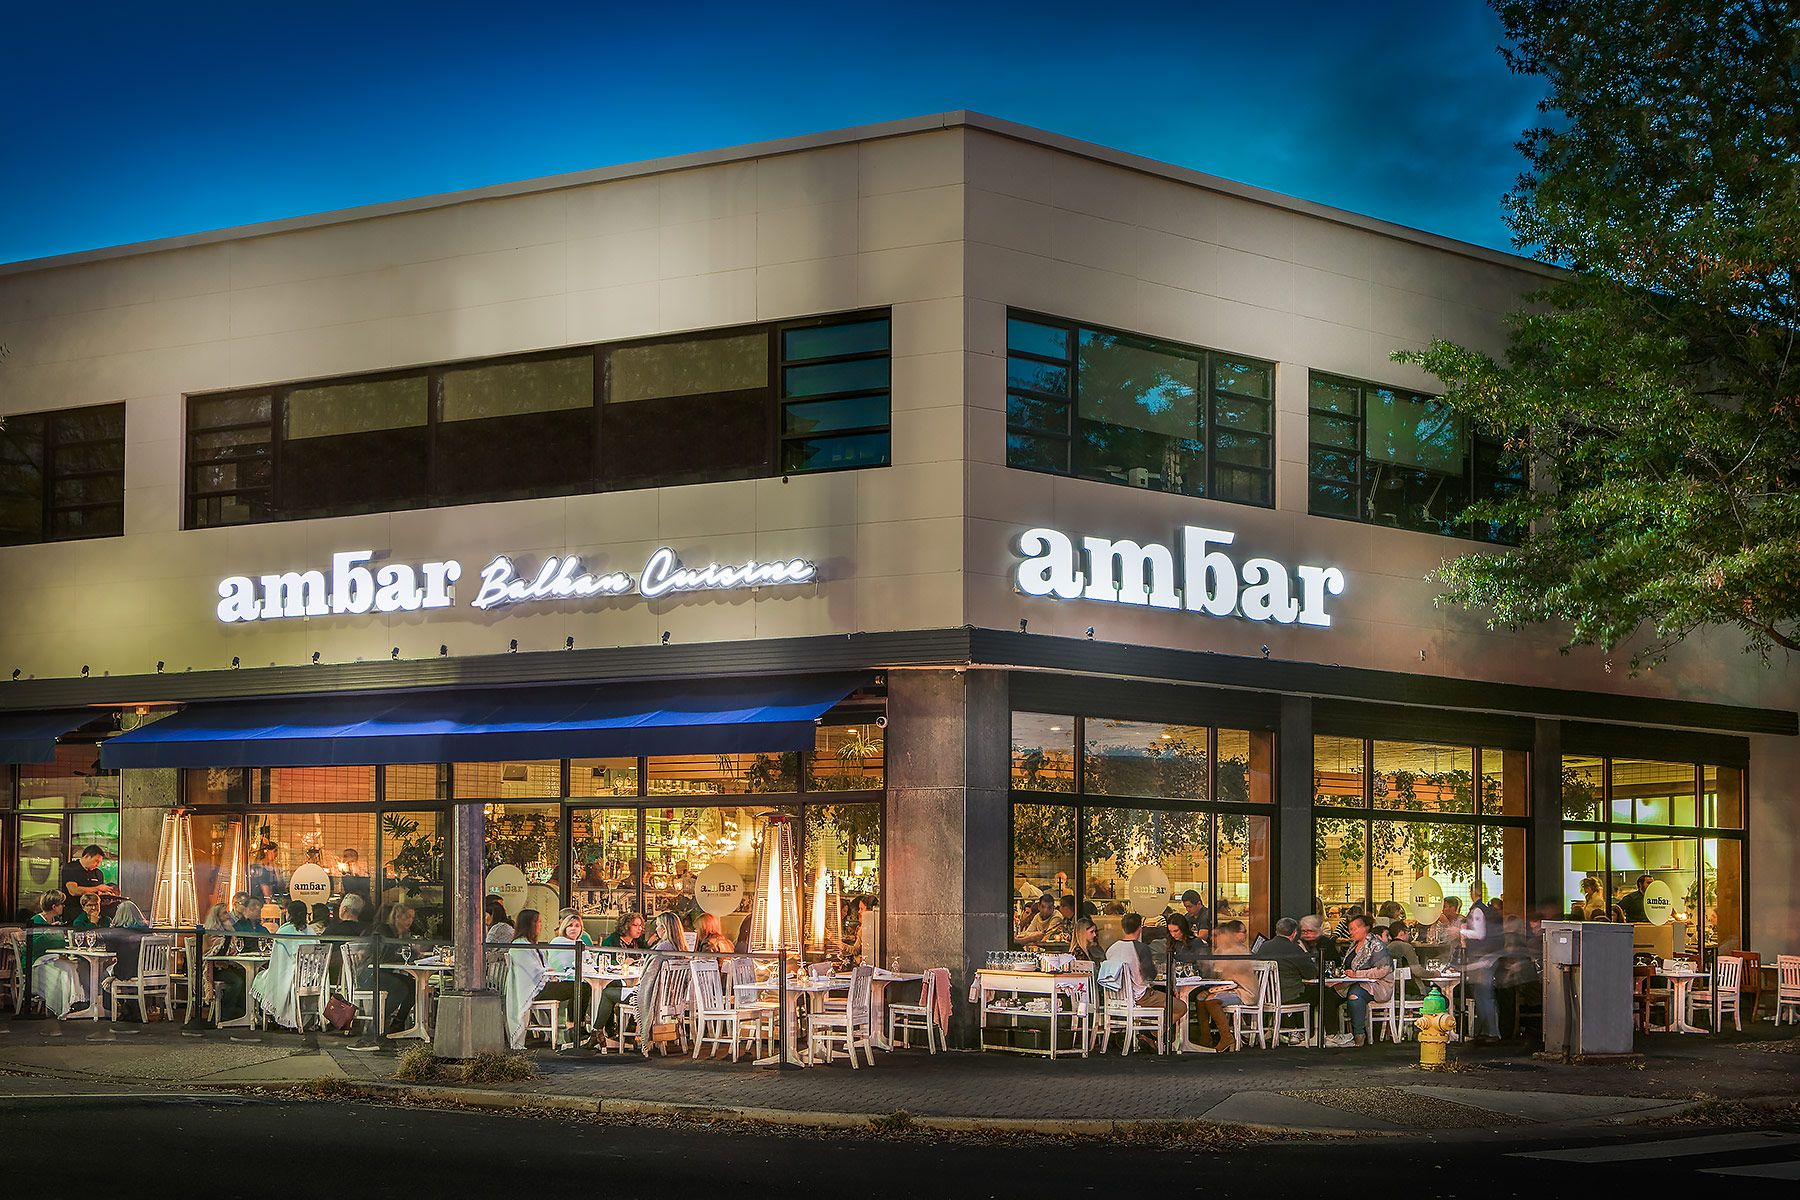 Ambar_2017-7865-Edit.jpg